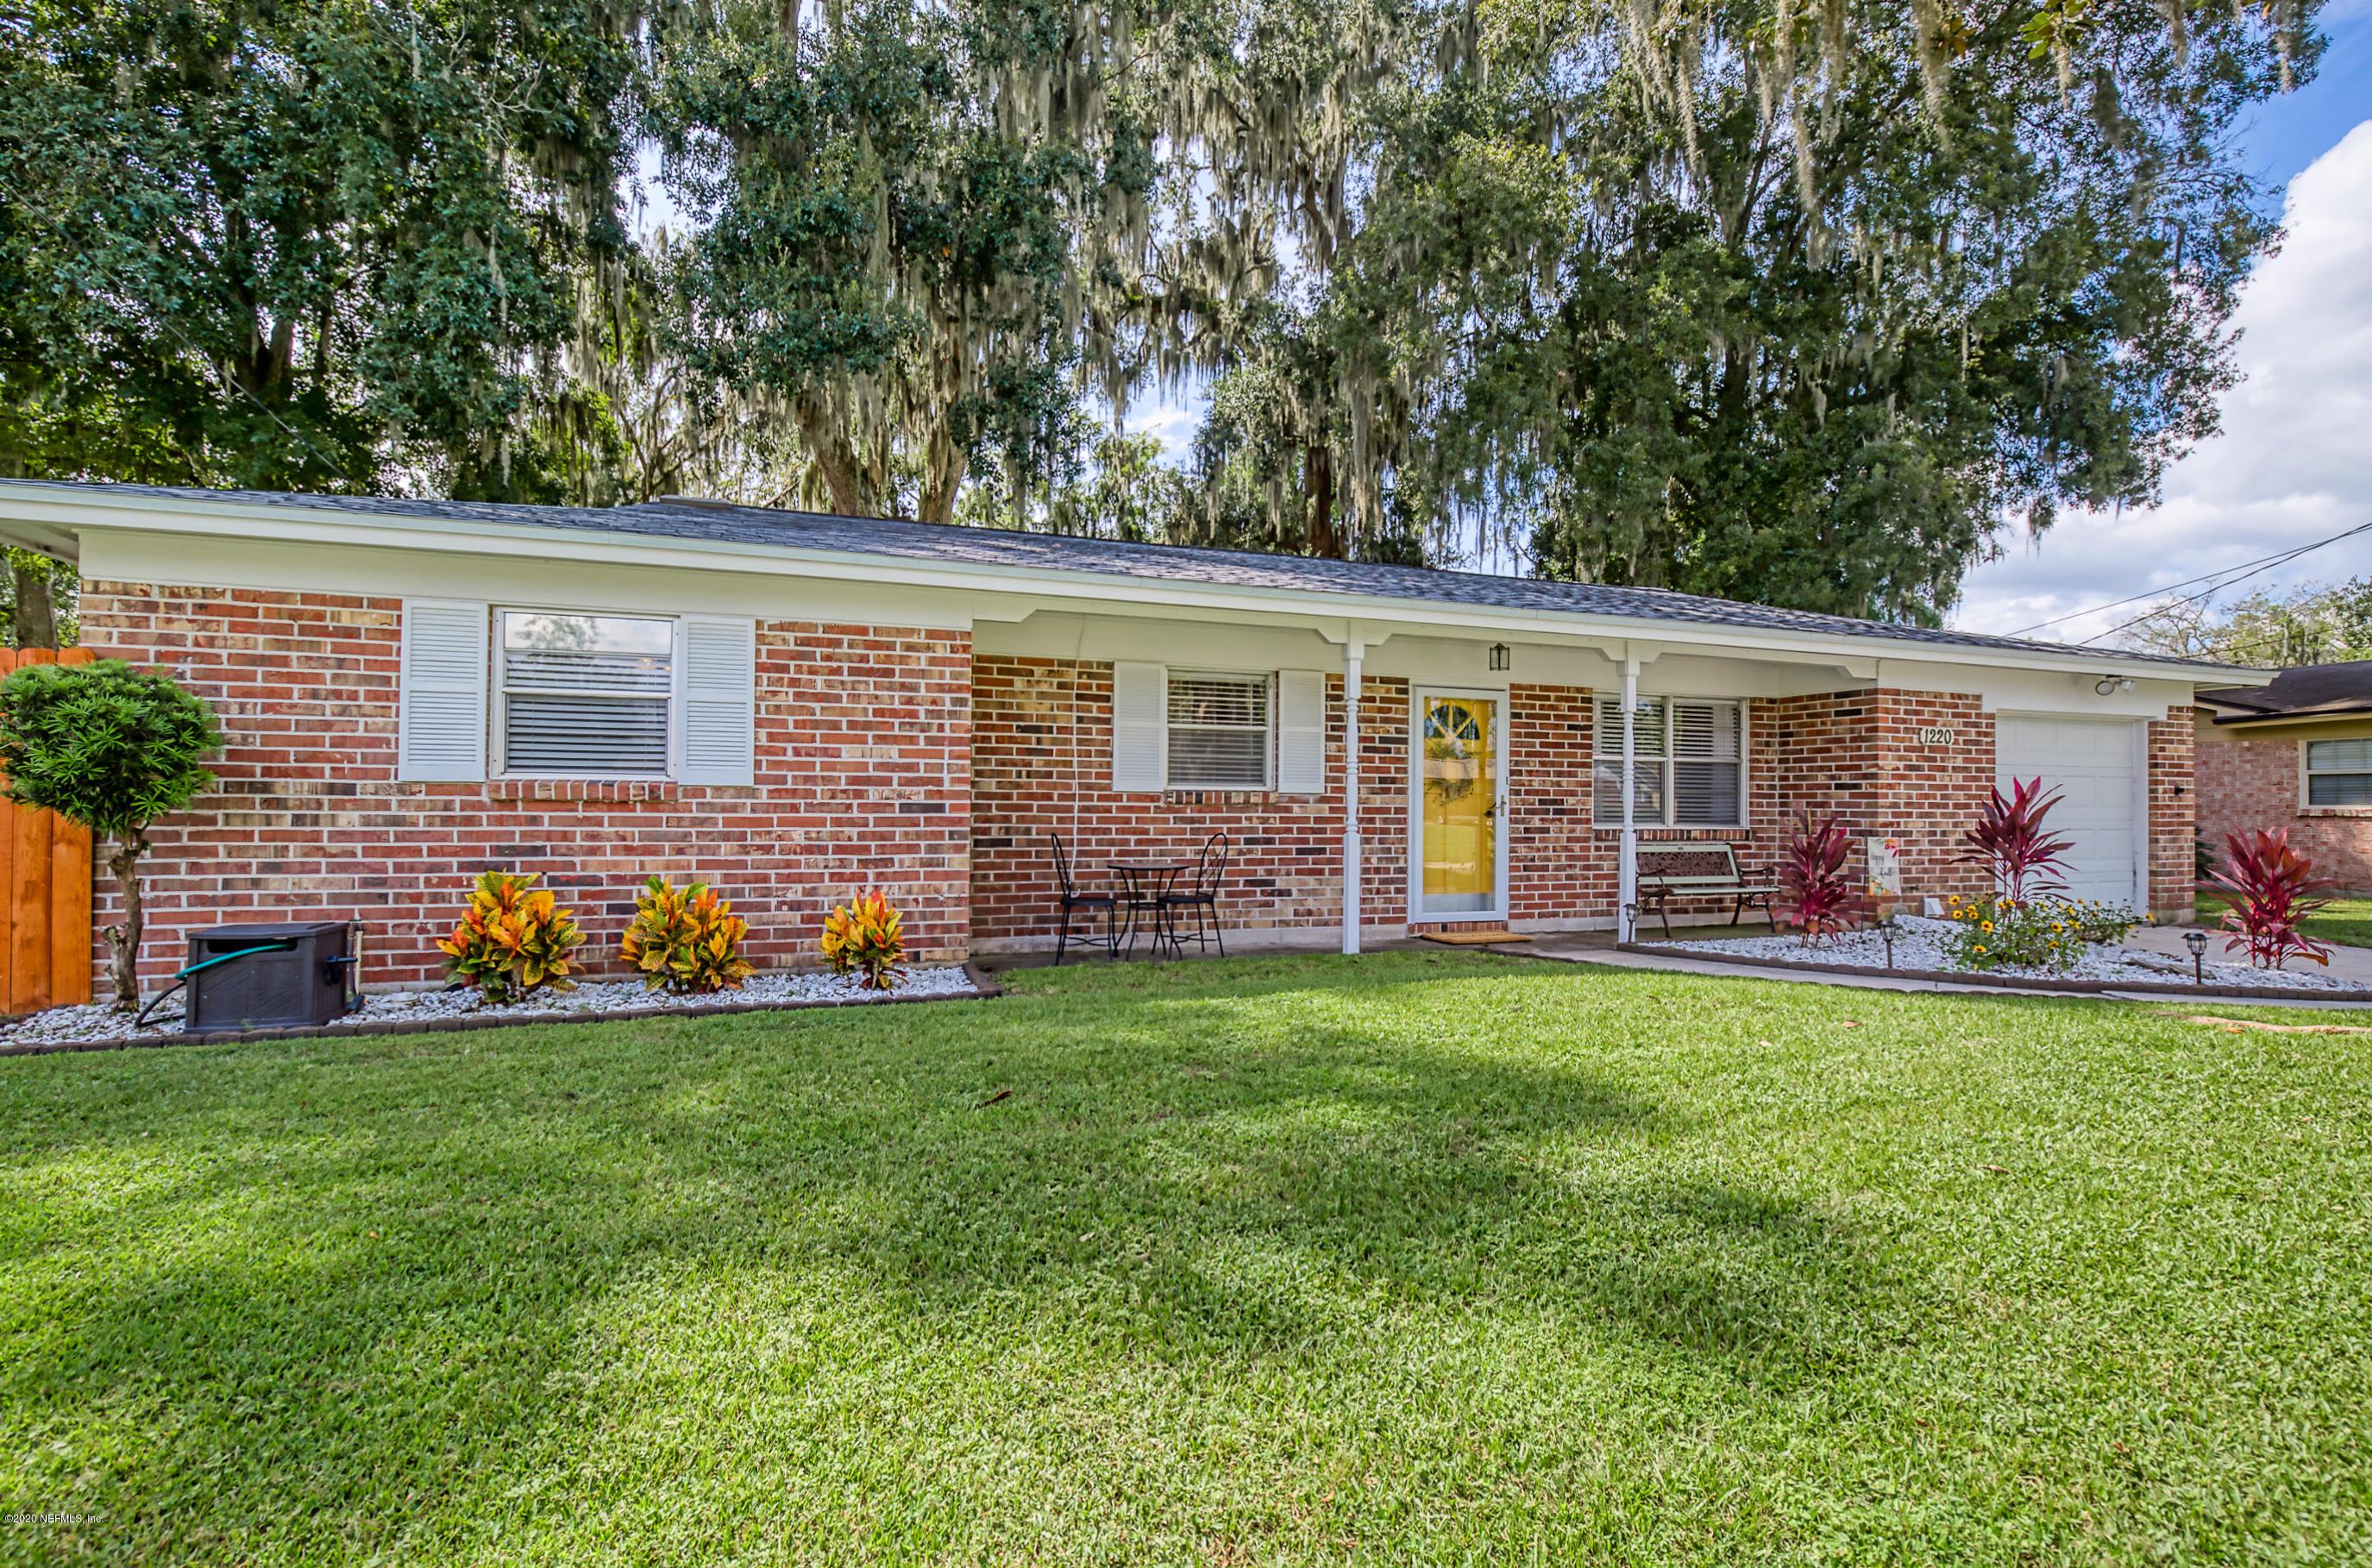 1220 ARBOR, ORANGE PARK, FLORIDA 32073, 4 Bedrooms Bedrooms, ,2 BathroomsBathrooms,Residential,For sale,ARBOR,1077159